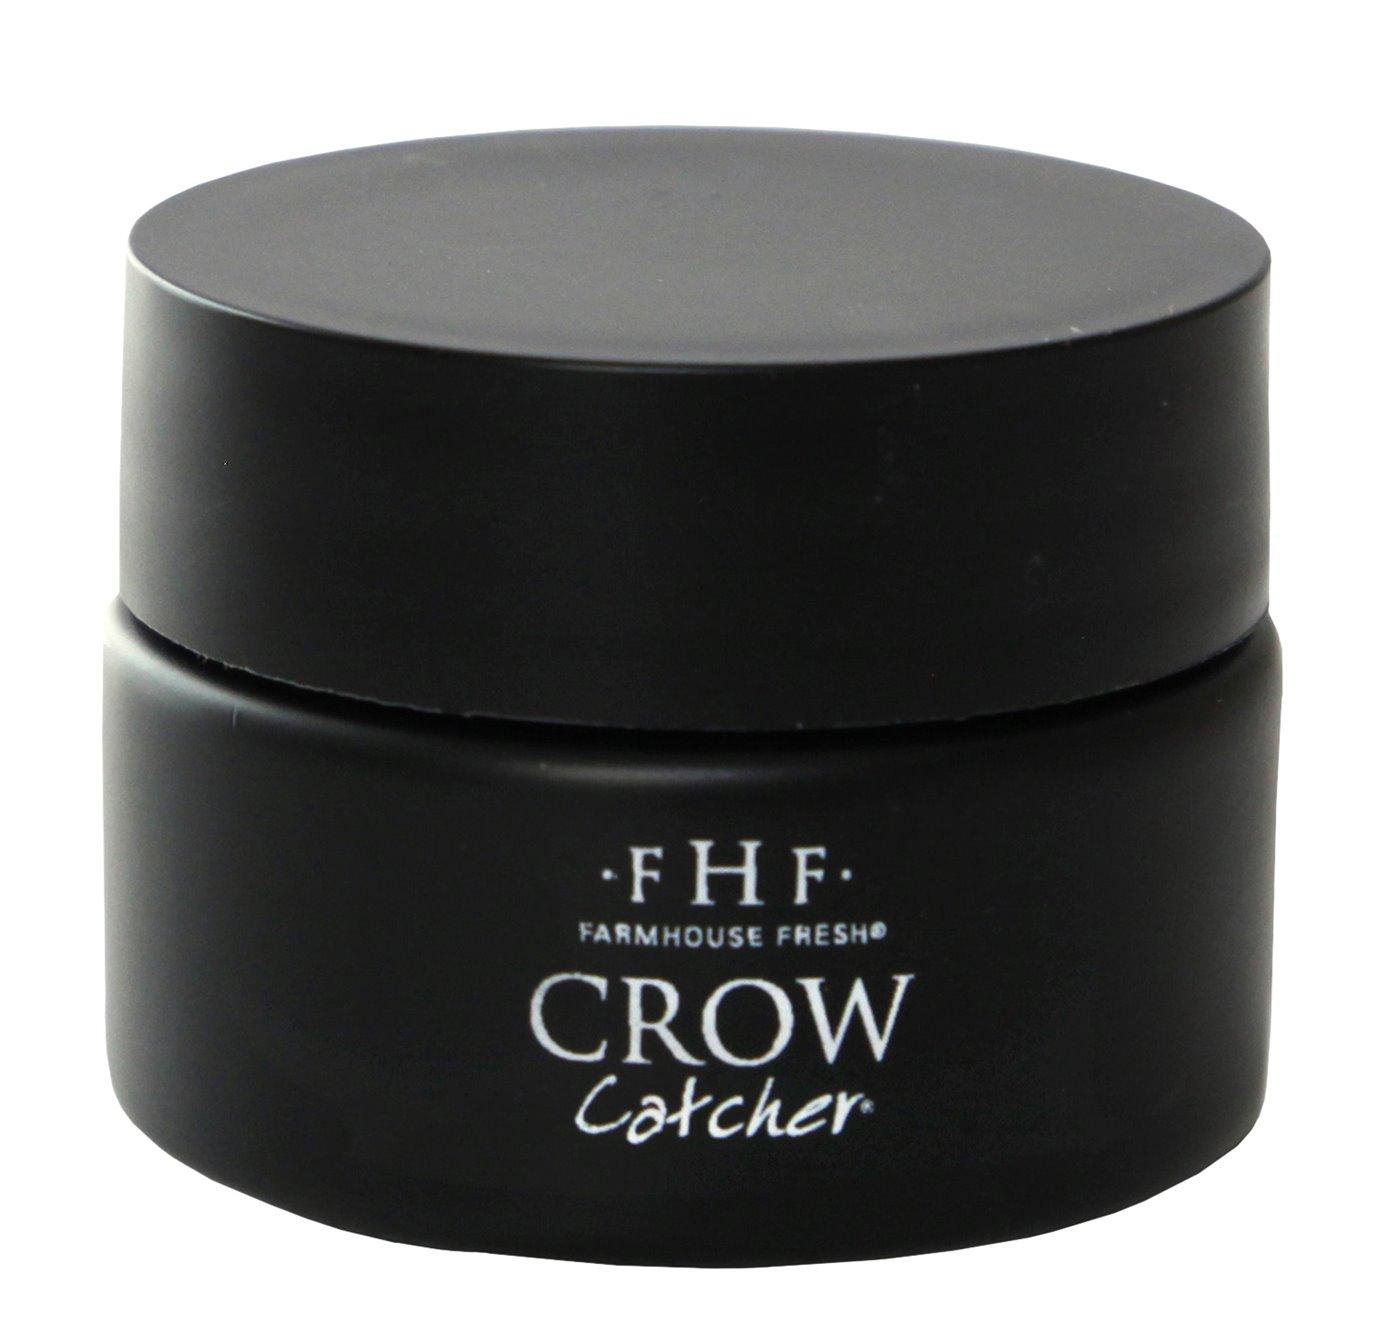 Farmhouse Fresh Crow Catcher Serum